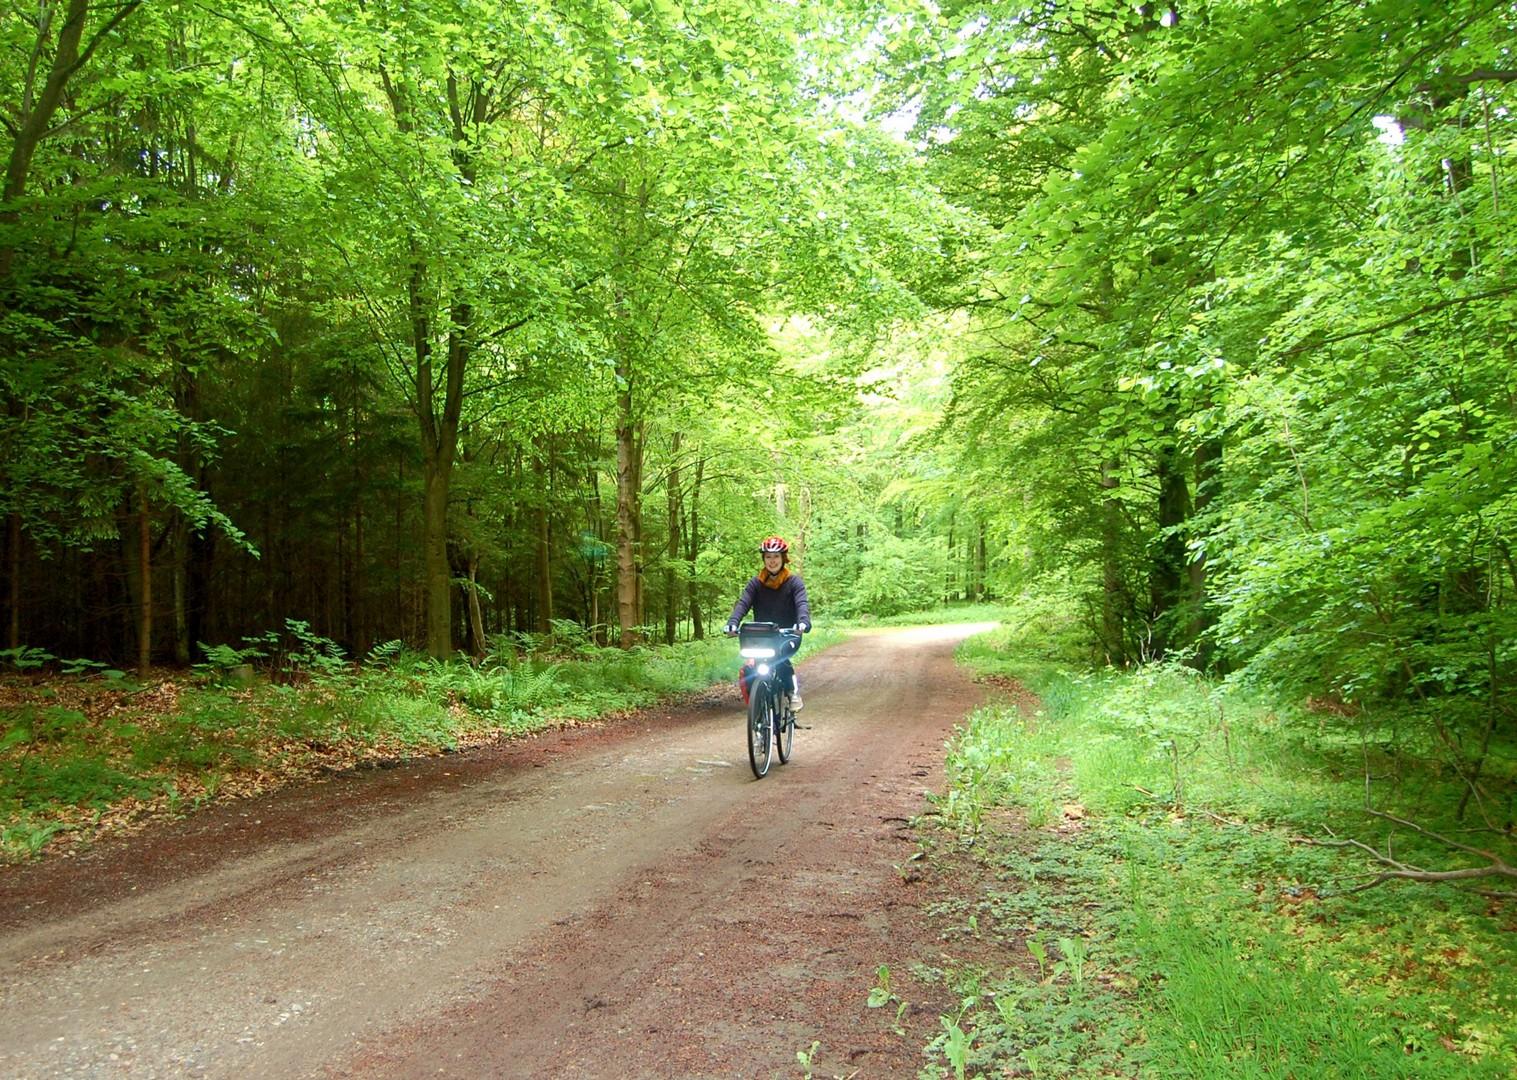 denmark-forest-cycling-leisure-holiday.jpg - Denmark - Coast, Castles and Copenhagen - Self-Guided Leisure Cycling Holiday - Leisure Cycling